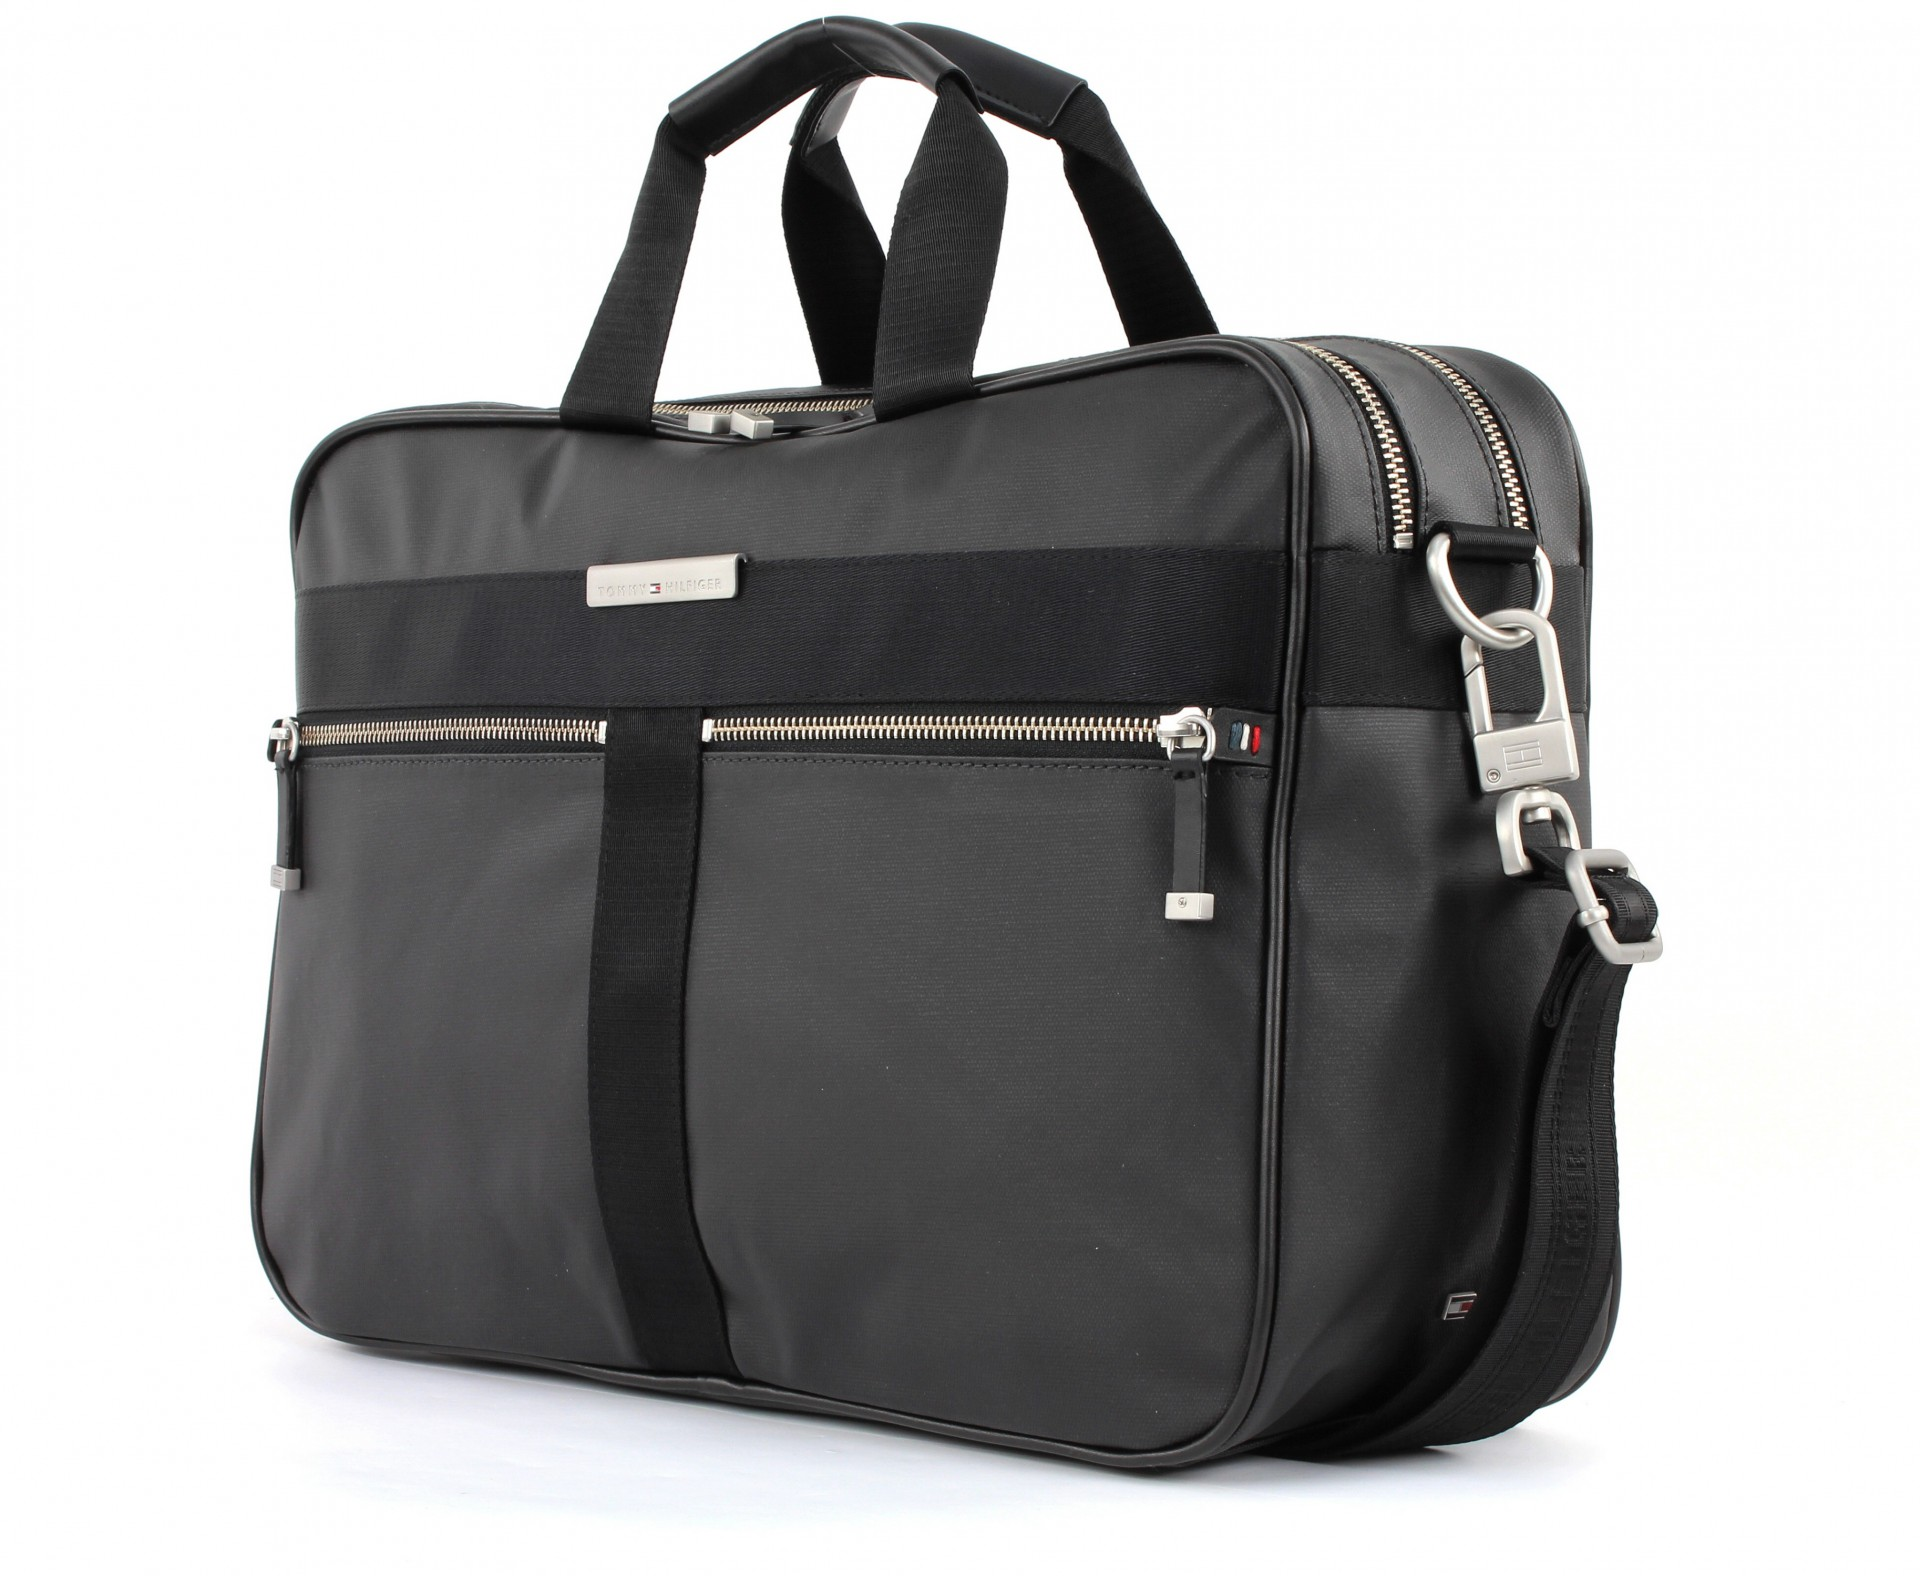 tommy hilfiger darren briefcase aktentasche umh ngetasche tasche black herren ebay. Black Bedroom Furniture Sets. Home Design Ideas